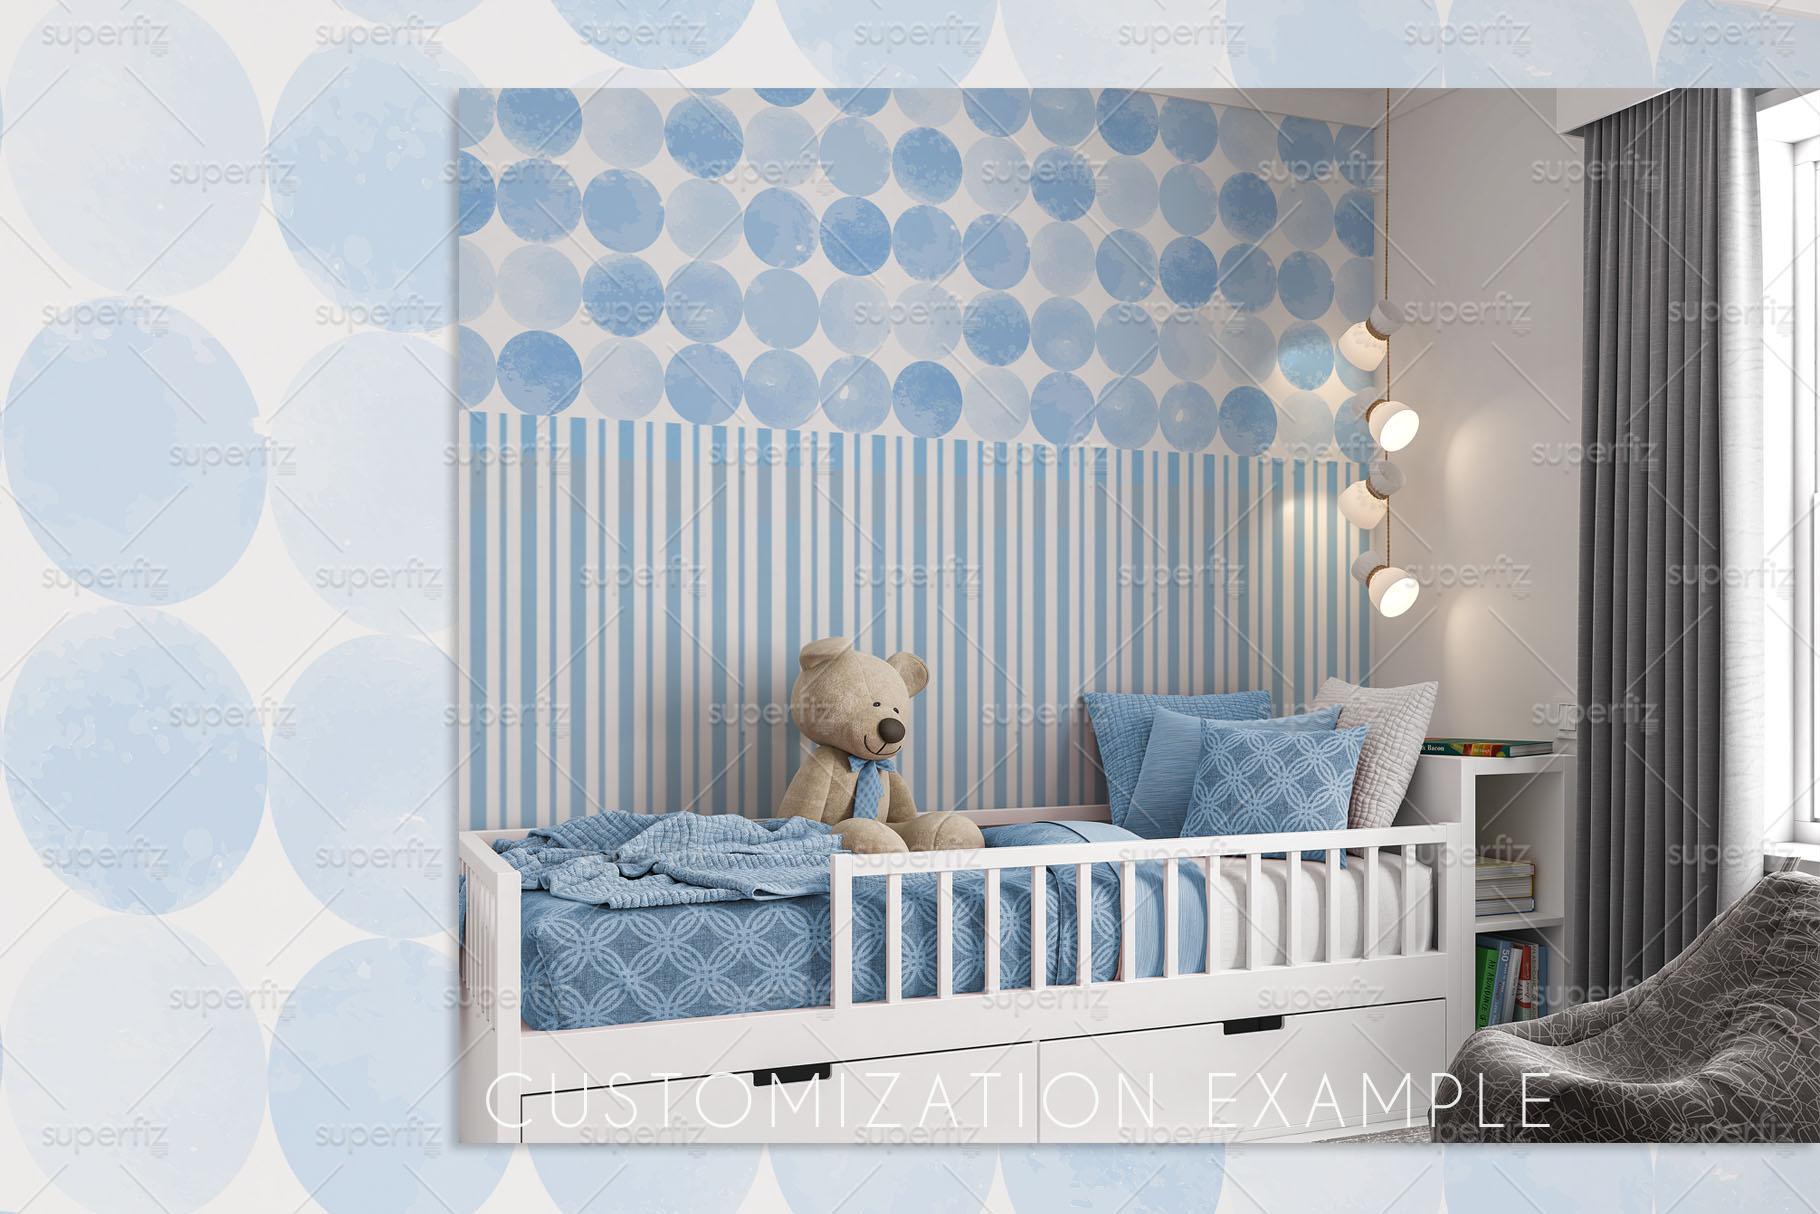 Wallpaper Mockup Kids Bedroom SM61 example image 6